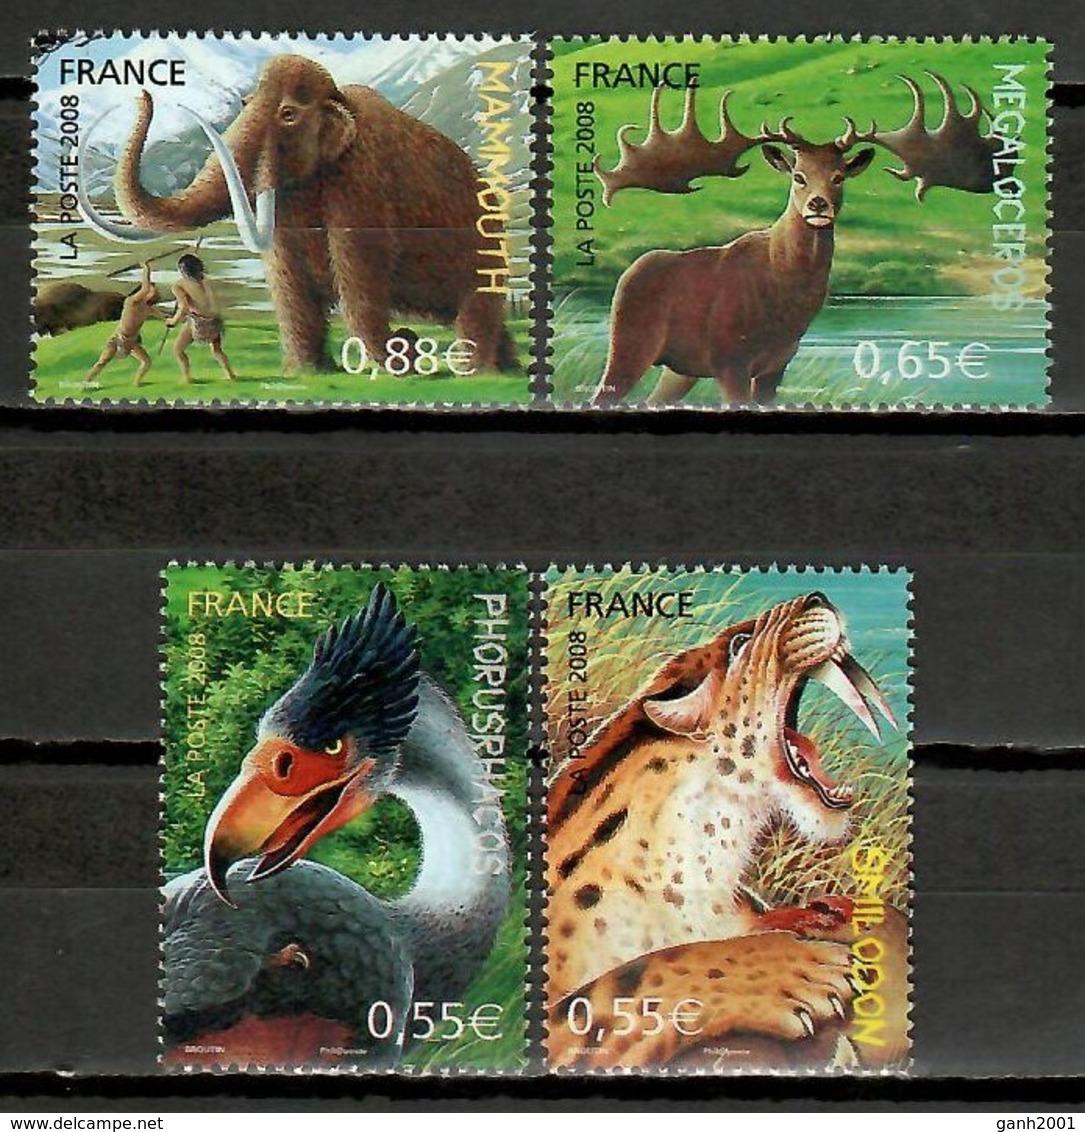 FRance 2008 Francia / Prehistoric Animals MNH Animales Prehistoricos Prähistorischen Tieren / Cu12011  36 - Prehistóricos